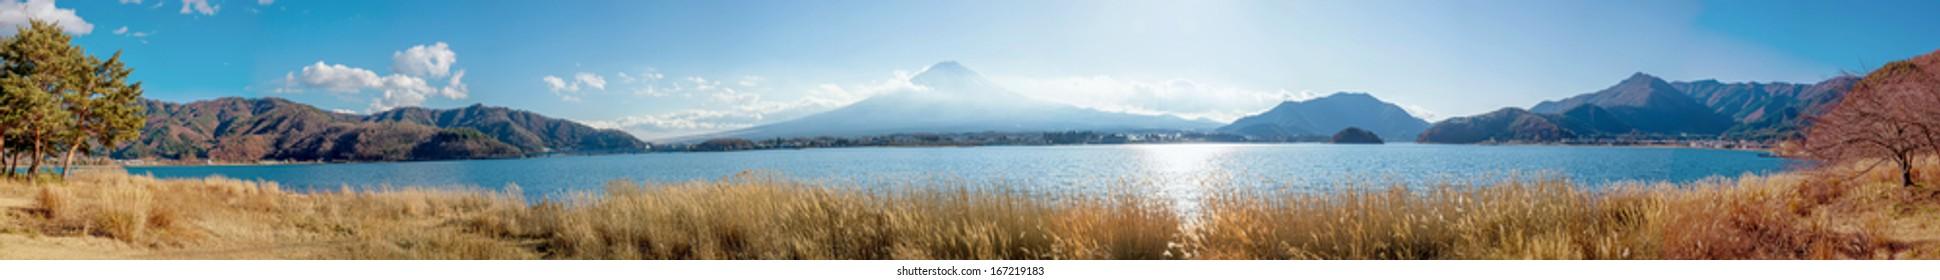 Panorama of Mount Fuji at kawaguchiko, japan